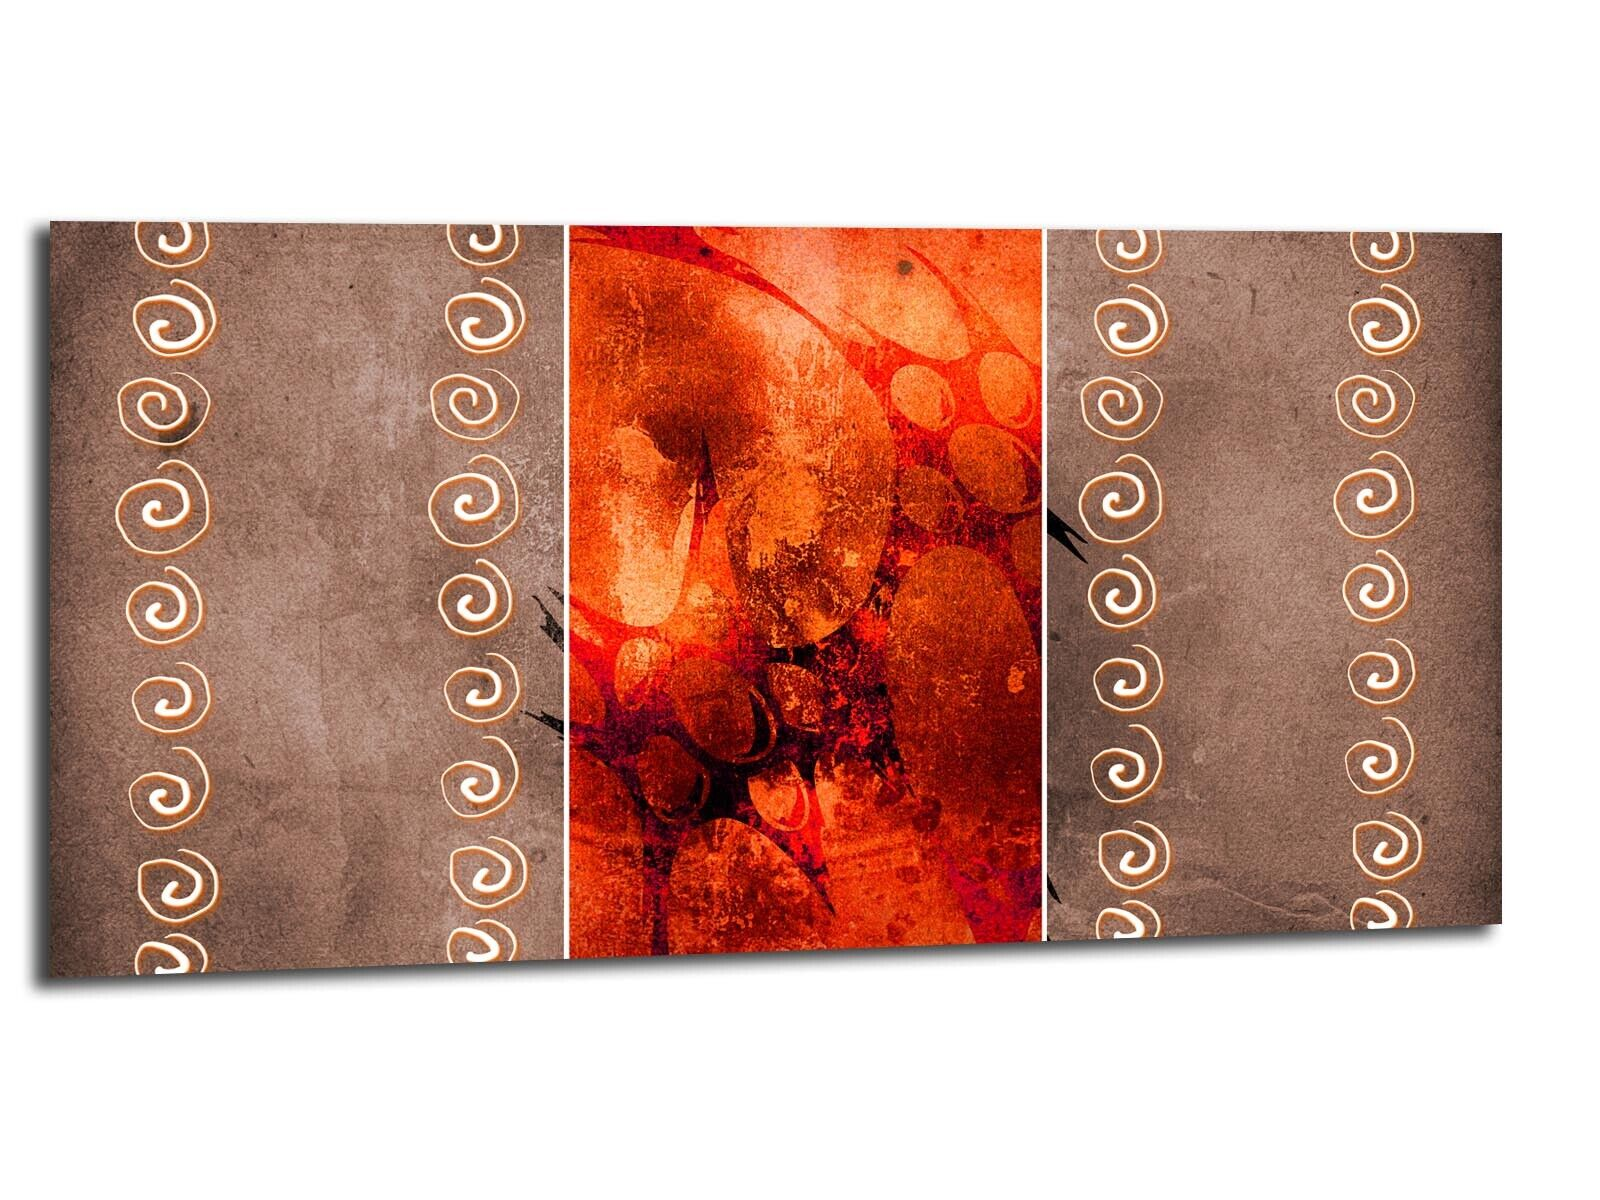 Alu-Dibond Bild ALU100501556 KUNST ZEICHEN Orange 100 x 50 cm Wandbild ABSTRAKT